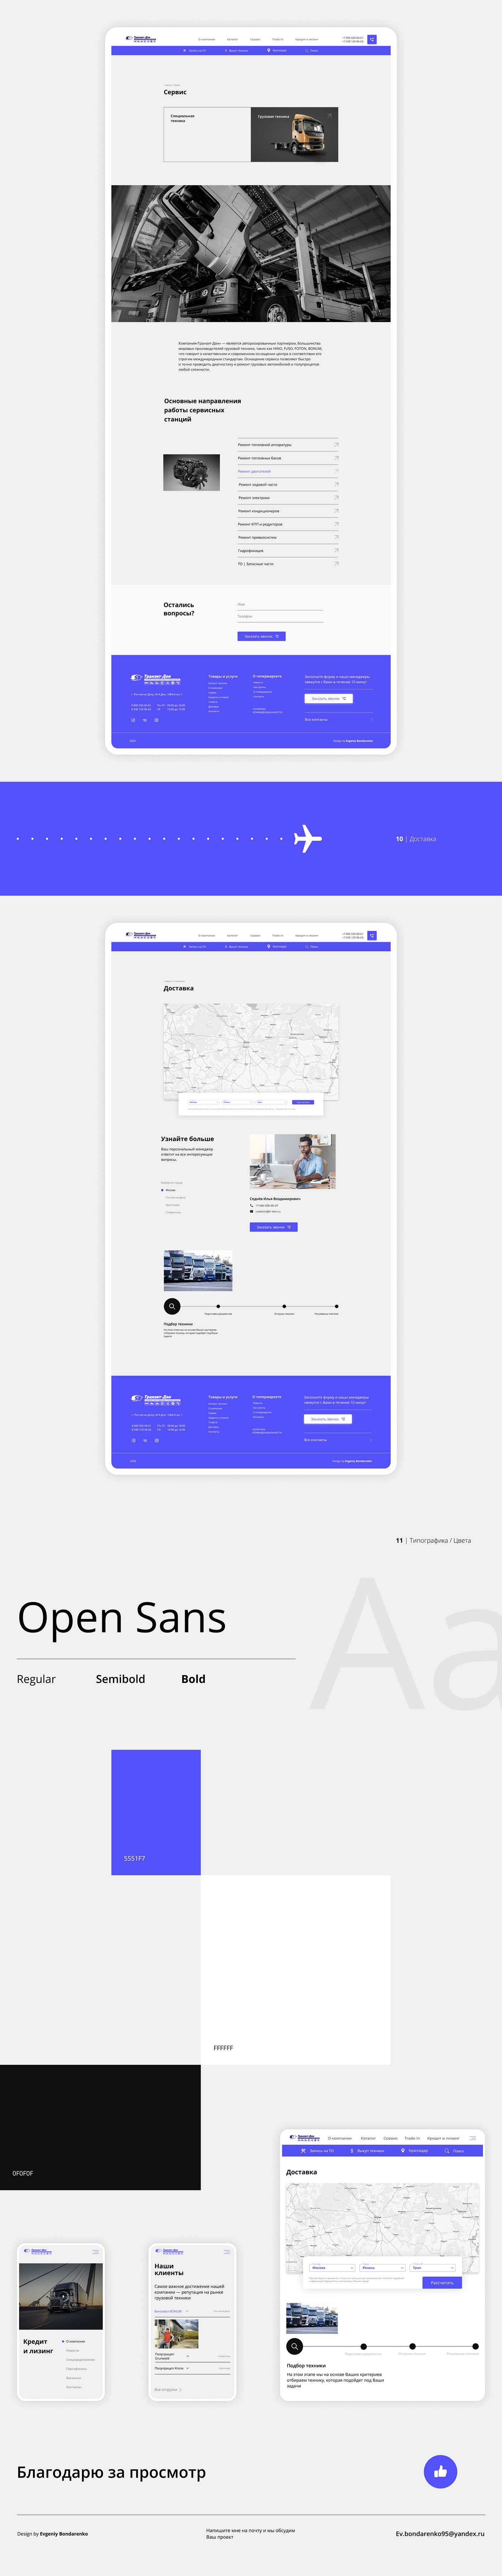 Adaptive design Interface mobile UI ux/ui Web